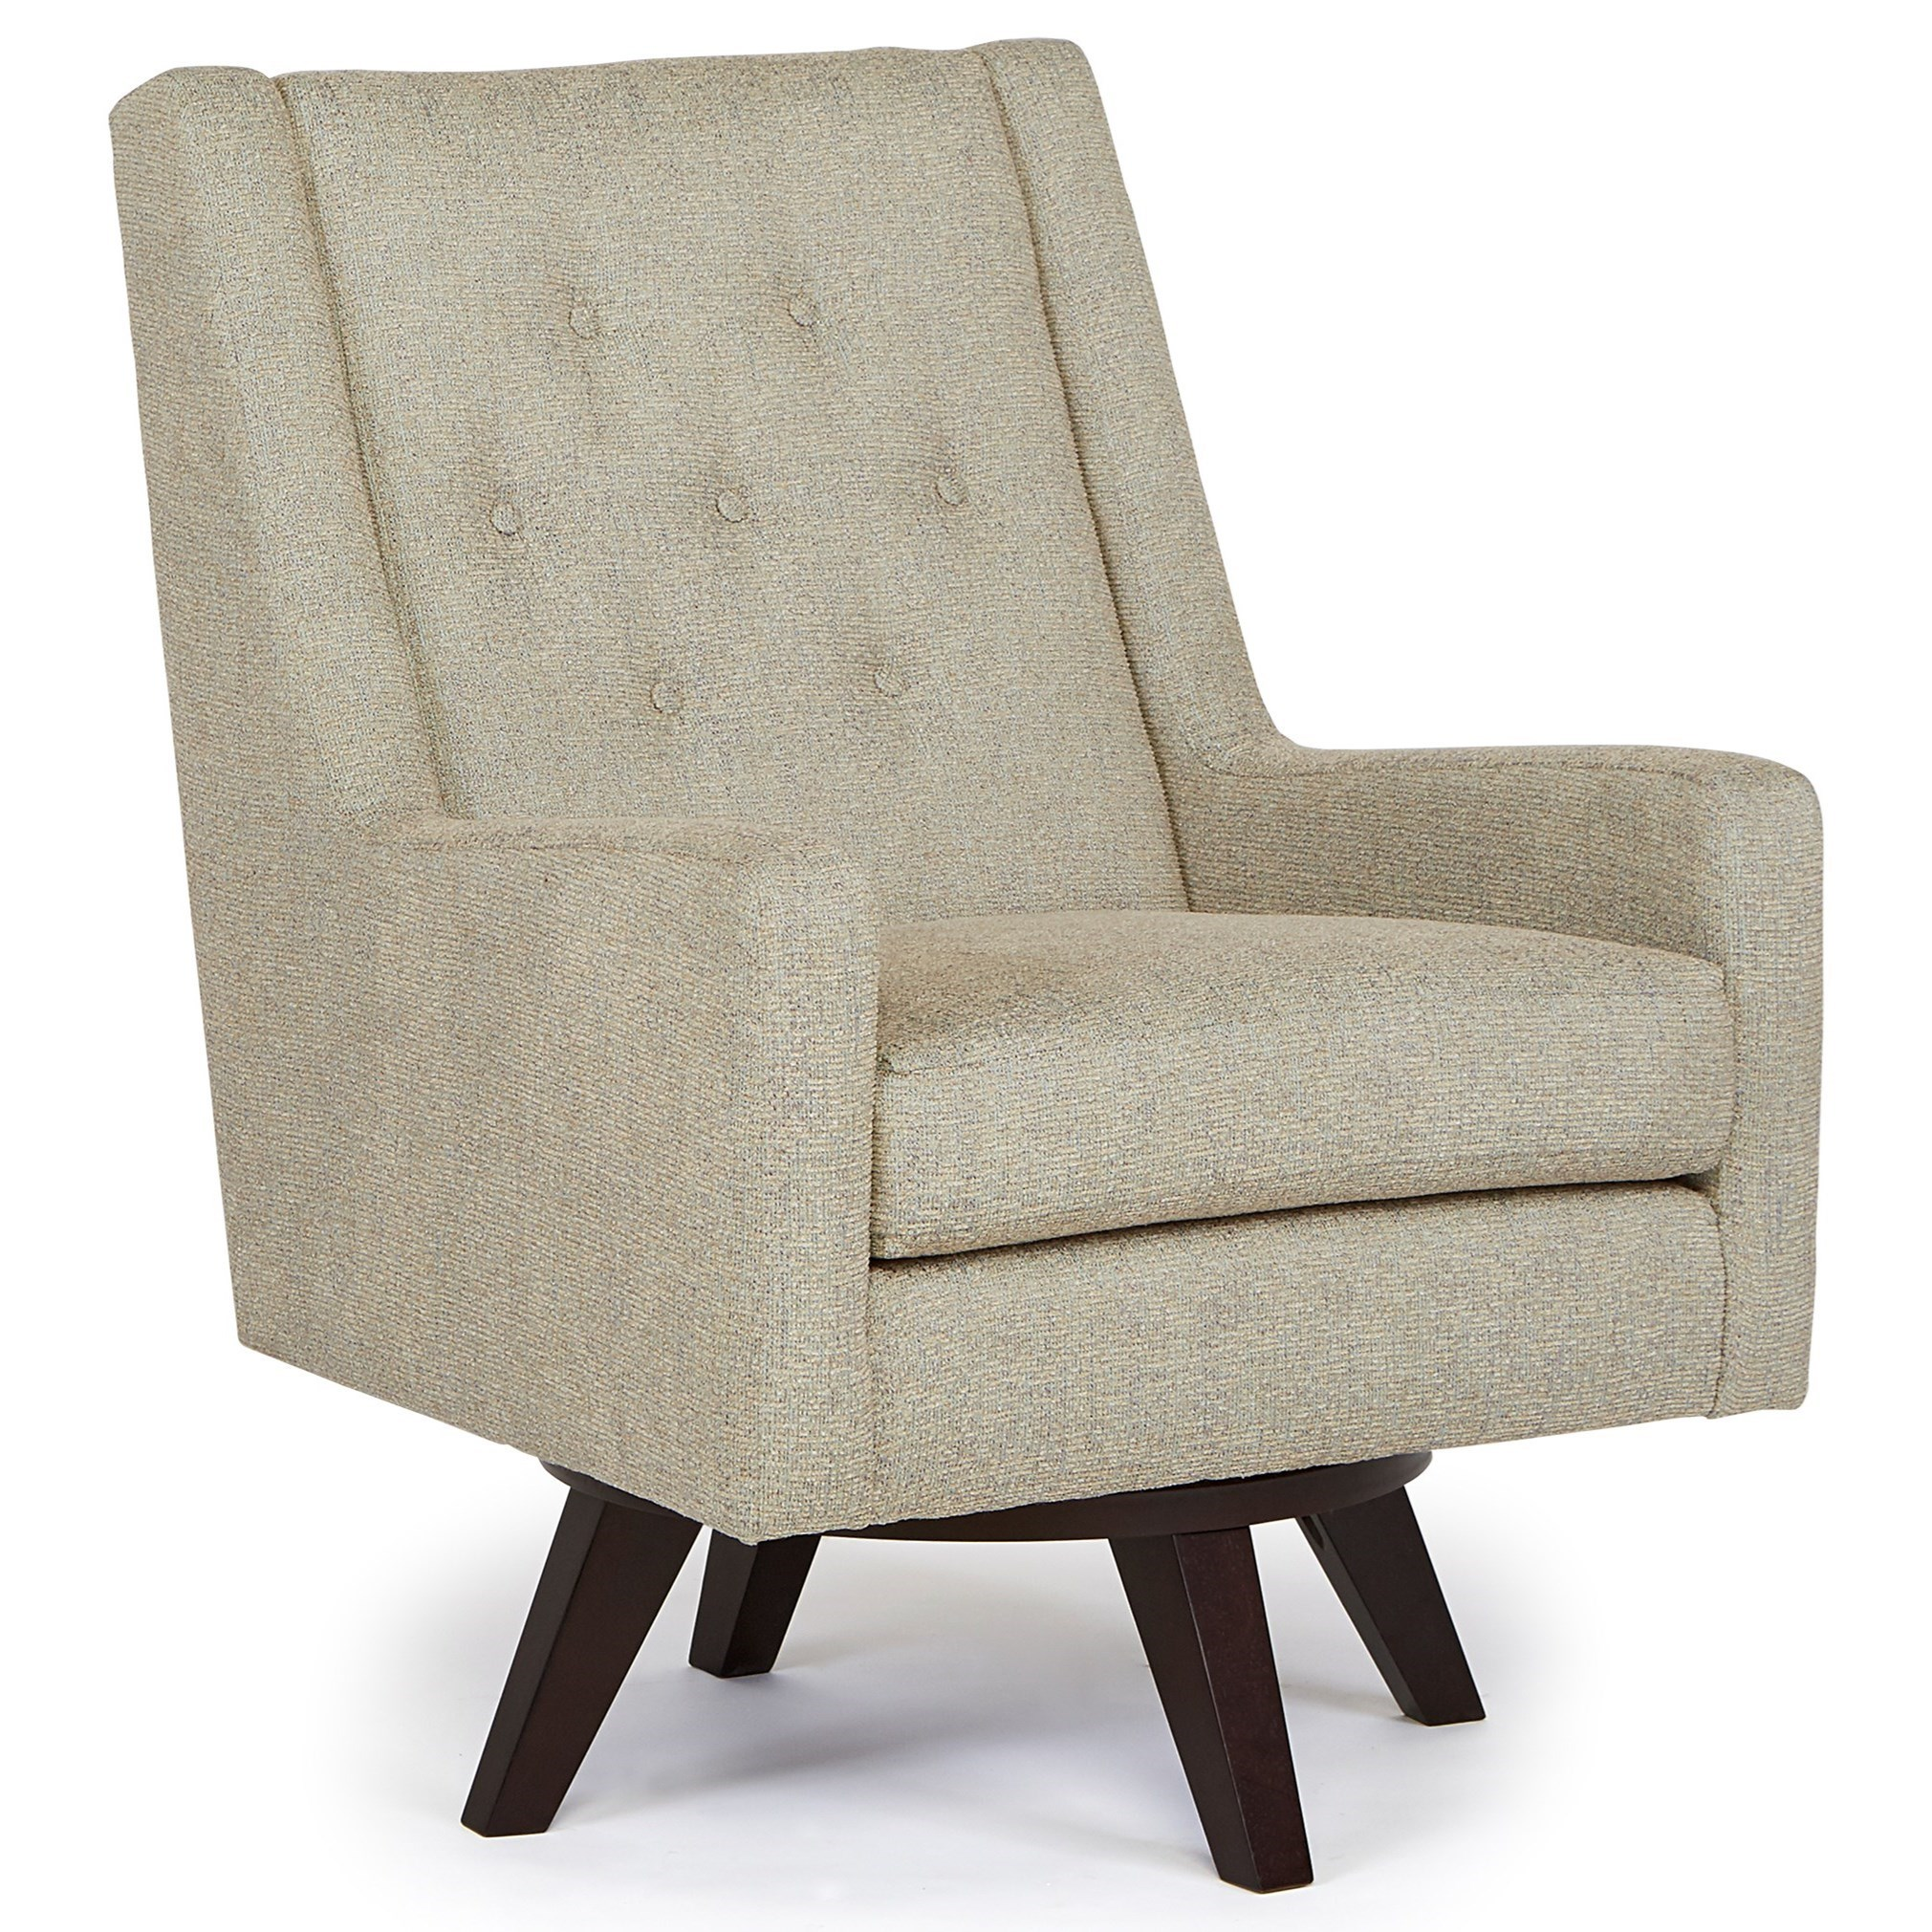 Best Home Furnishings Chairs   Swivel BarrelKale Swivel Chair ...